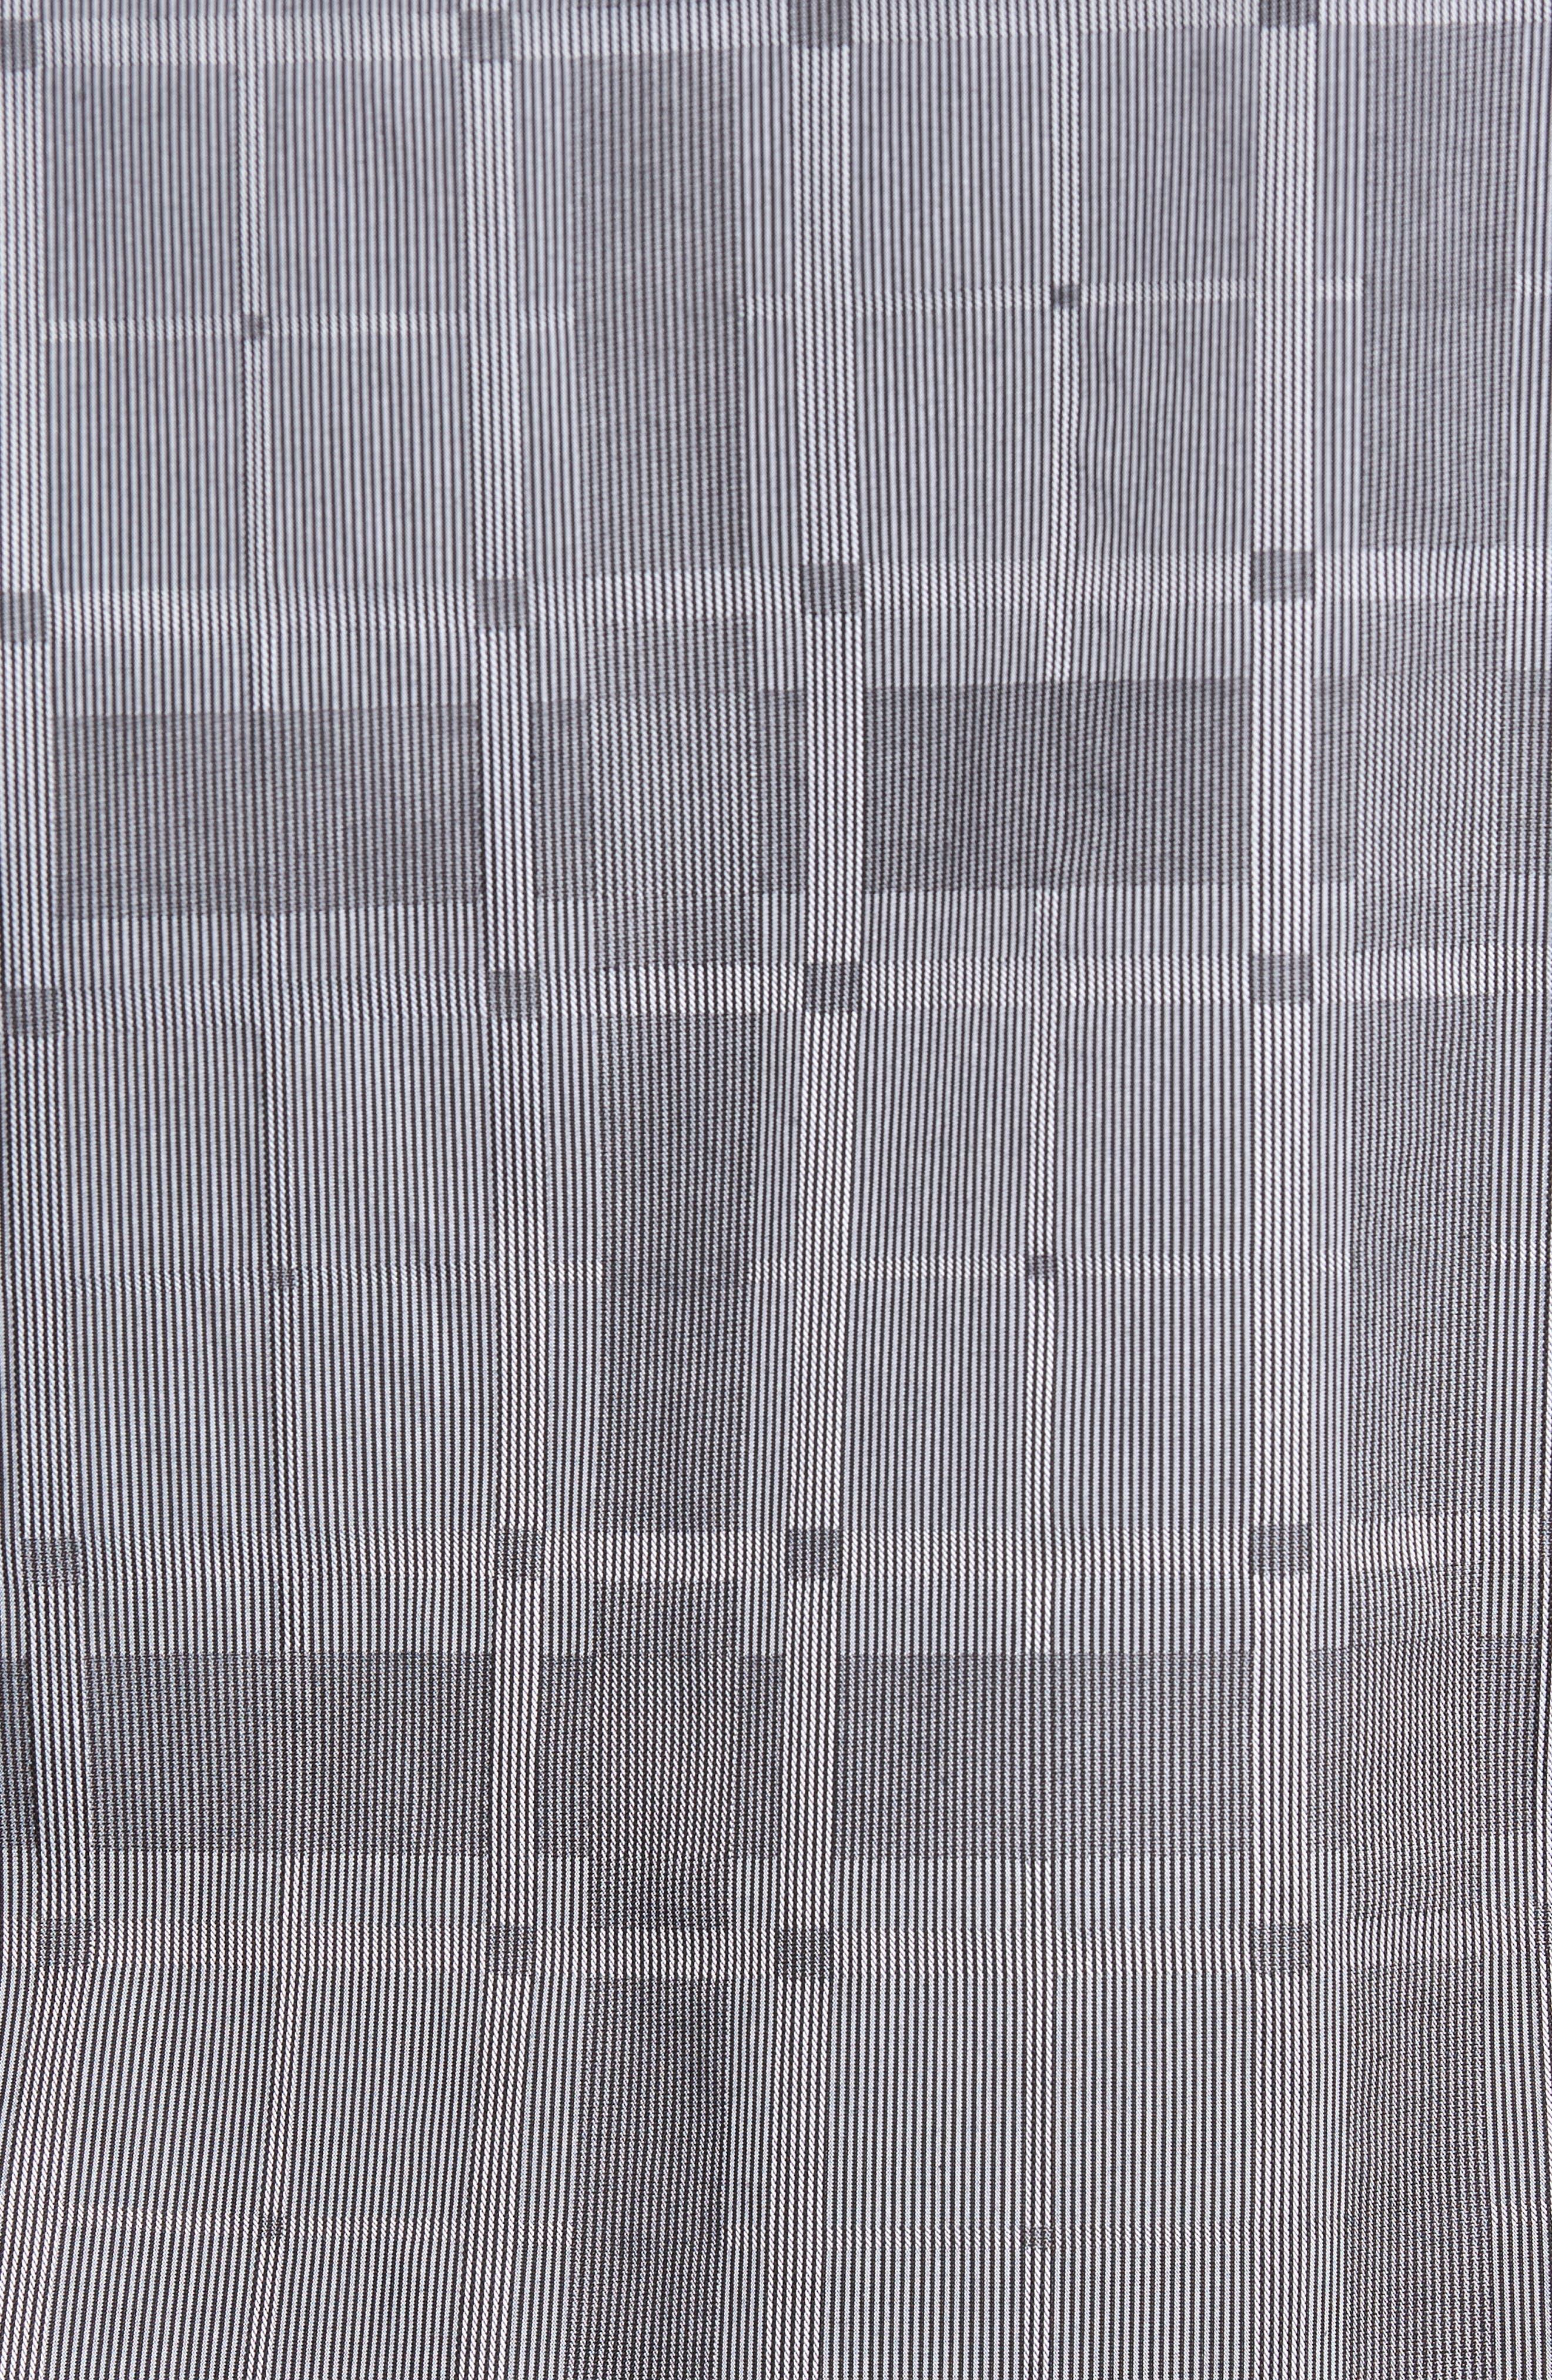 Slim Fit Microstripe Plaid Sport Shirt,                             Alternate thumbnail 5, color,                             020